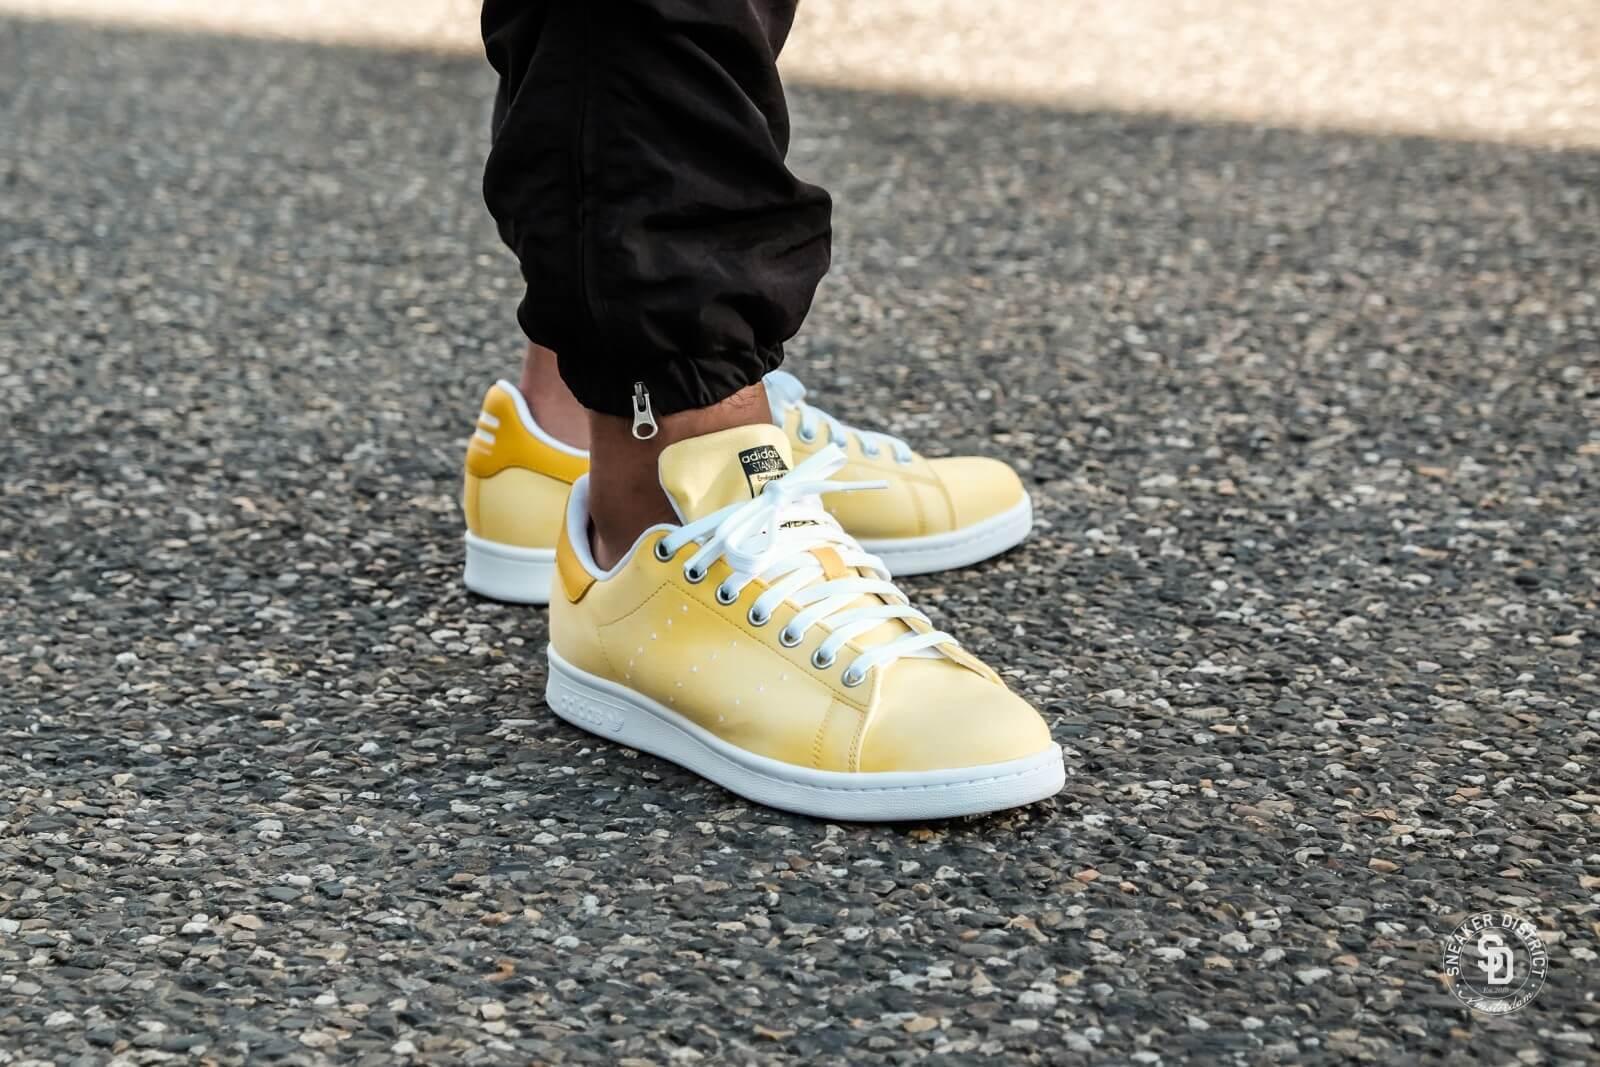 Adidas pharrell williams hu holi holi holi stan smith scarpe gialle noi ac7042 hu razza umana | Fornitura sufficiente  f038d1